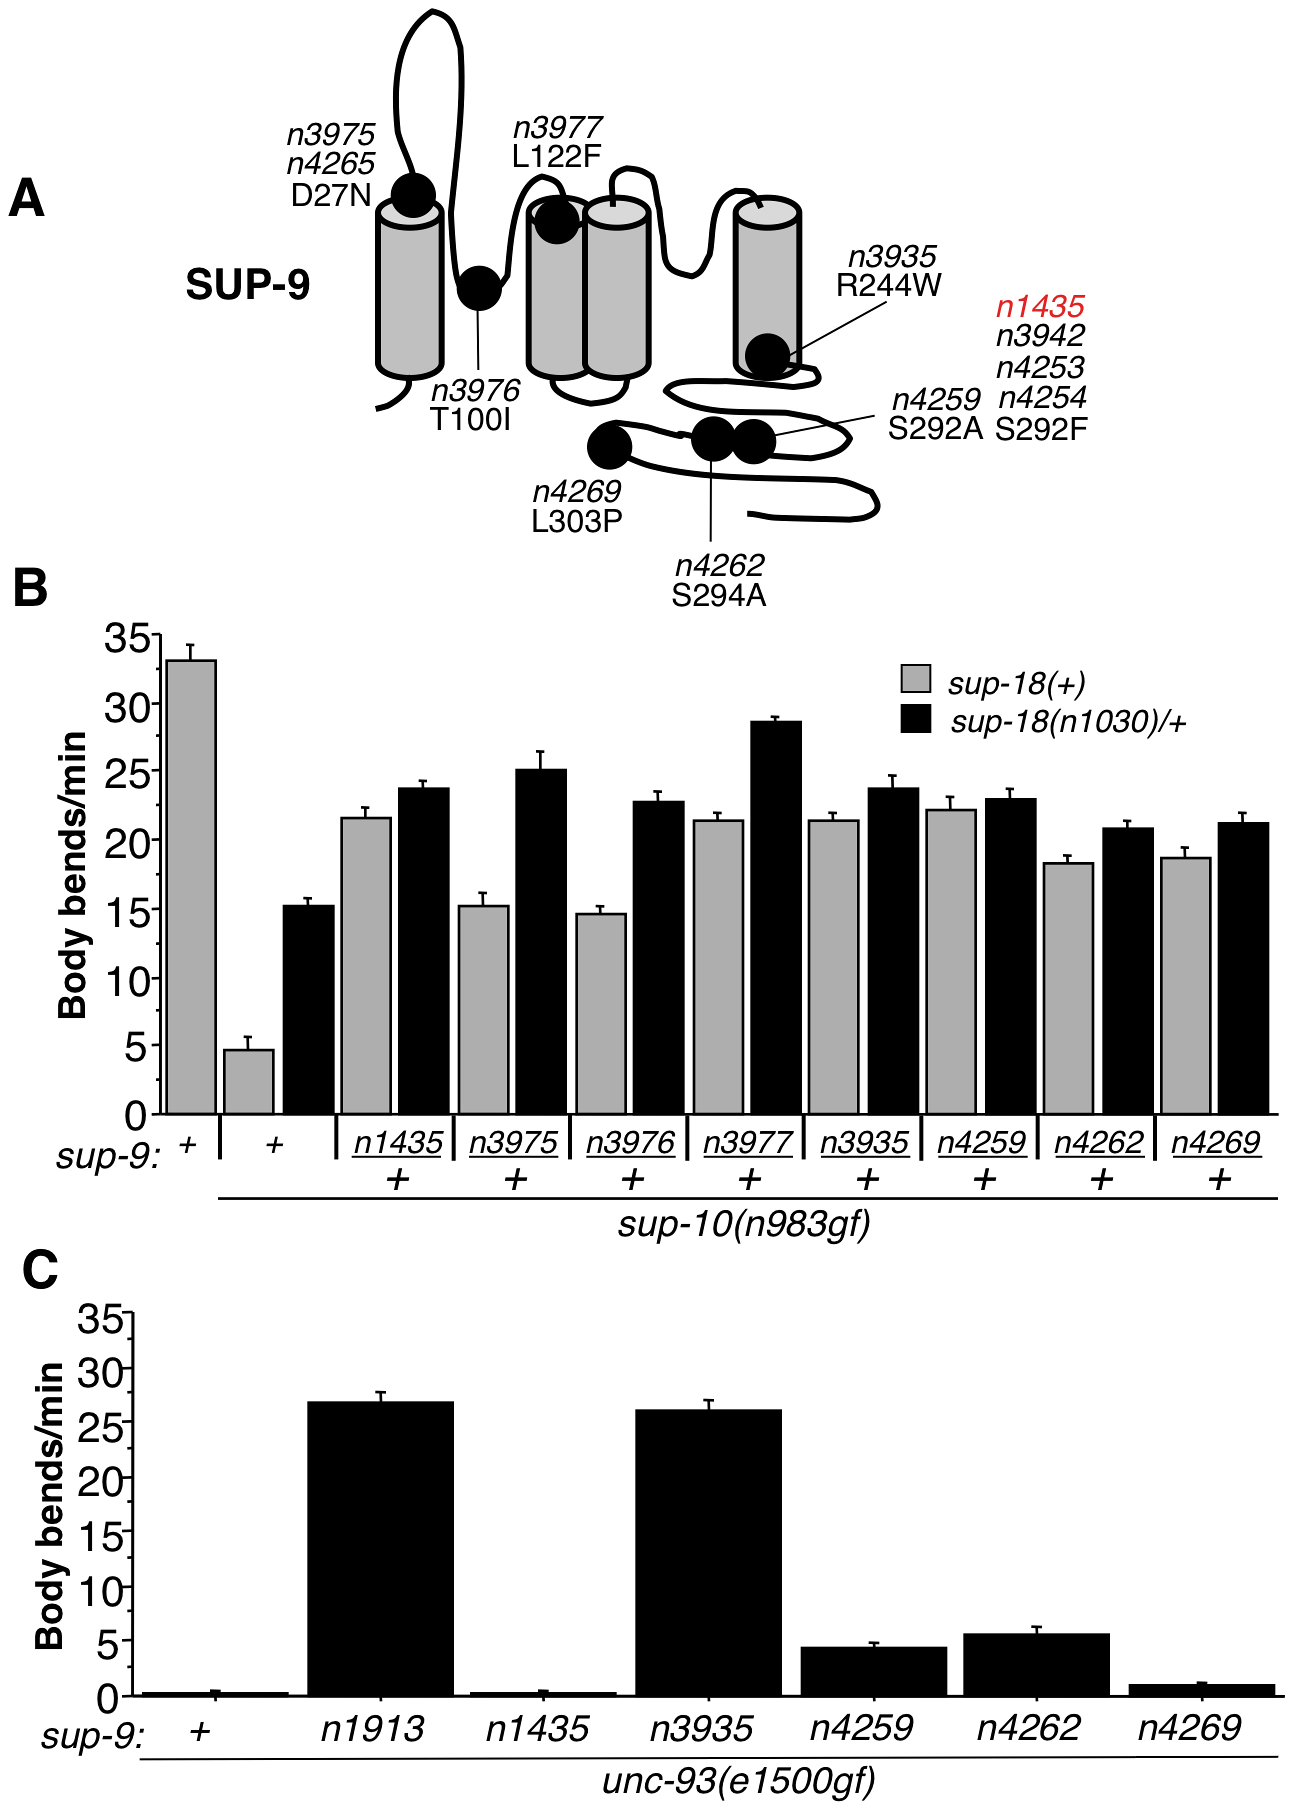 Characterization of novel <i>sup-9</i> alleles.